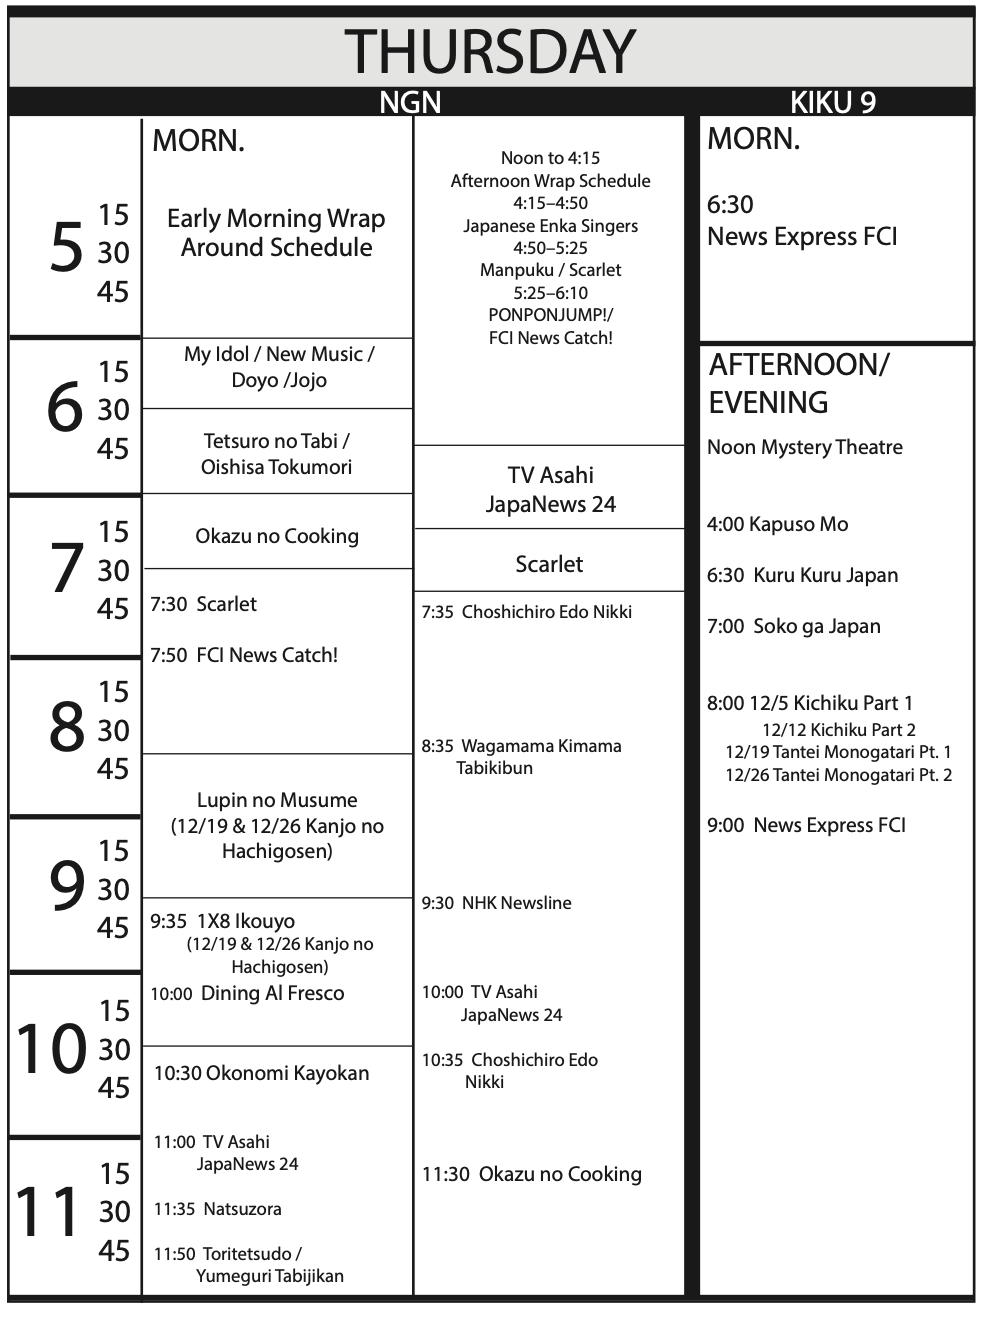 TV Program Schedule 11/15/19 Issue - Thursday